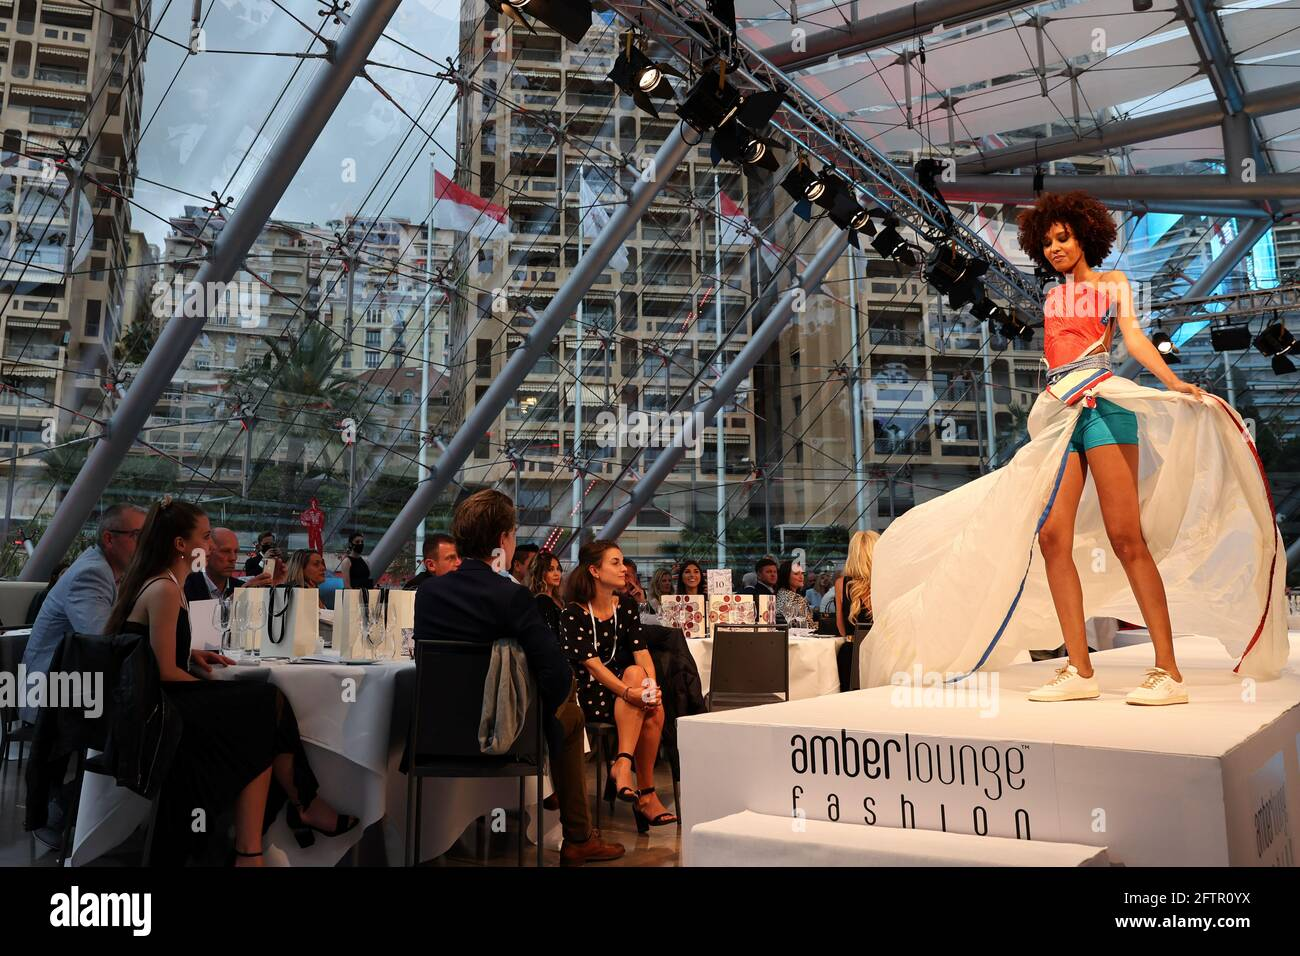 Monte Carlo, Monaco. Mai 2021. Die Amber Lounge Fashion Show. 21.05.2021. Formel-1-Weltmeisterschaft, Rd 5, Großer Preis Von Monaco, Monte Carlo, Monaco, Freitag. Quelle: XPB Images Ltd/Alamy Live News Stockfoto